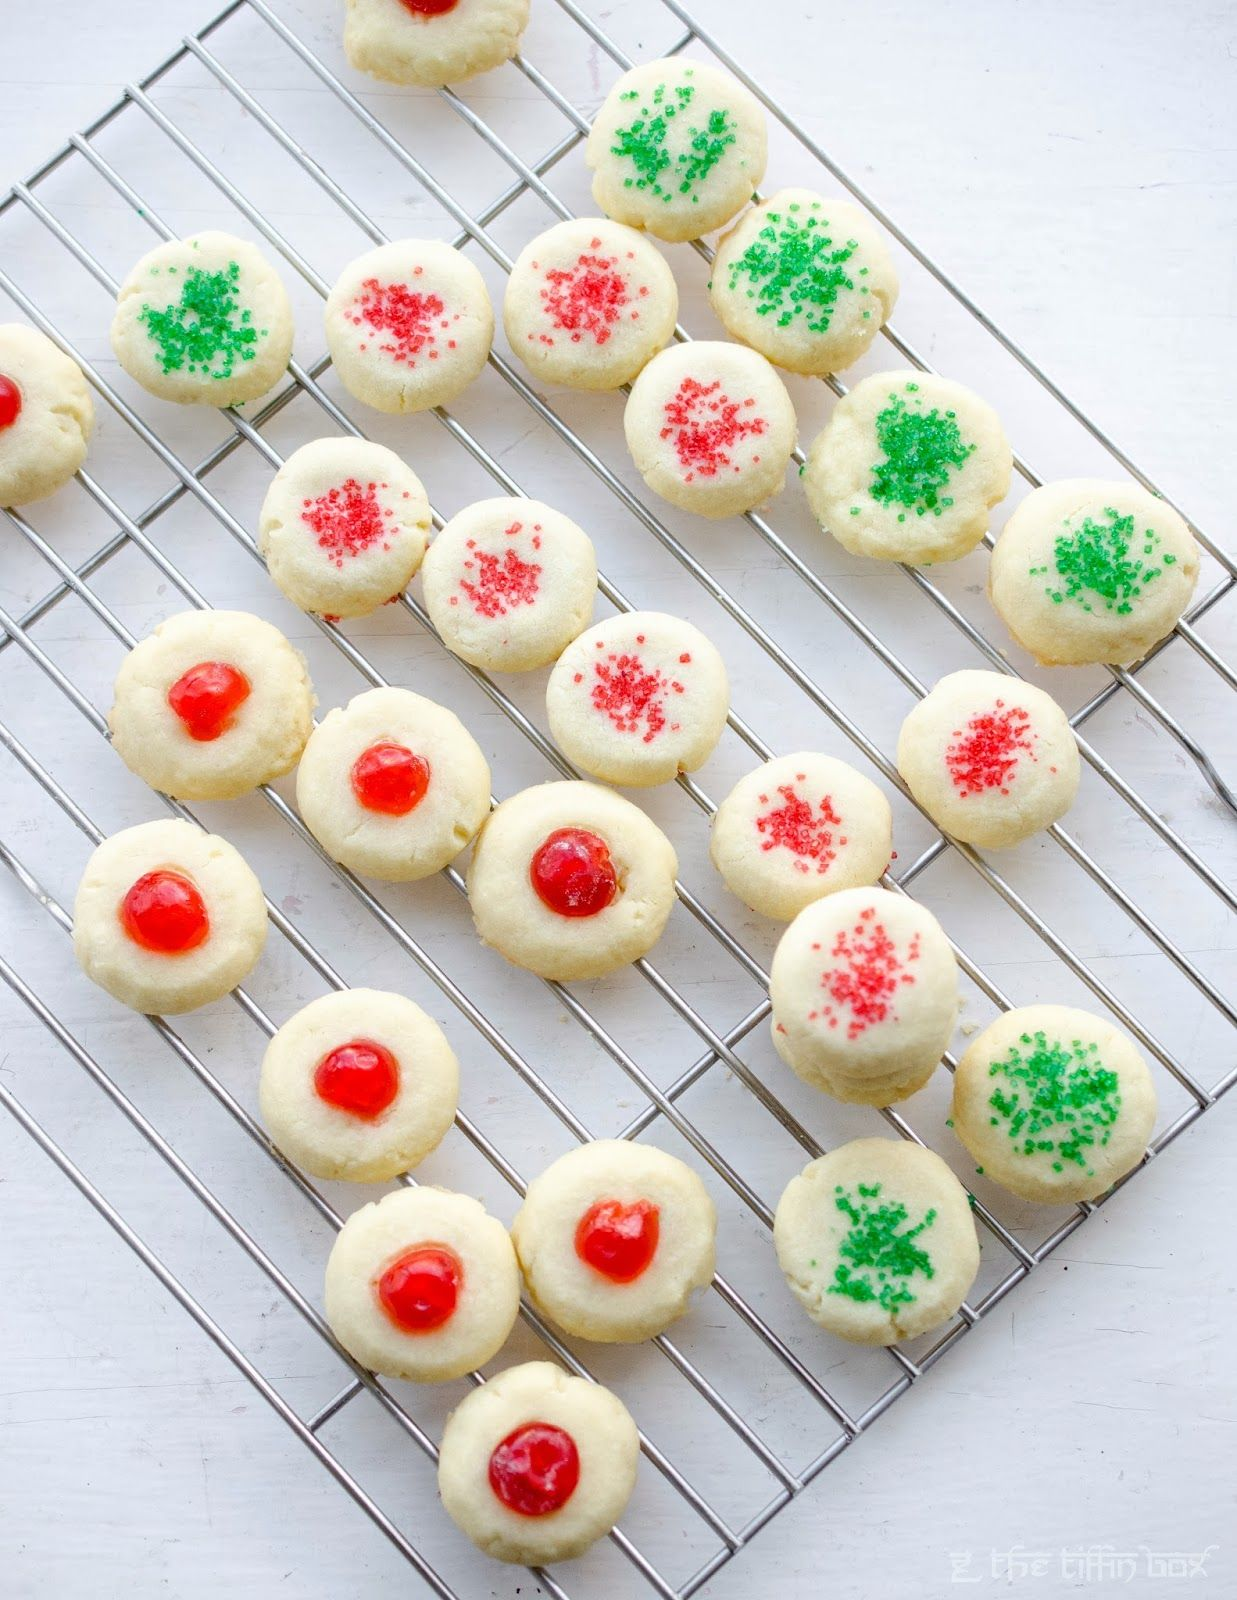 The Tiffin Box Lemon Scented Canada Cornstarch Shortbread Cookies